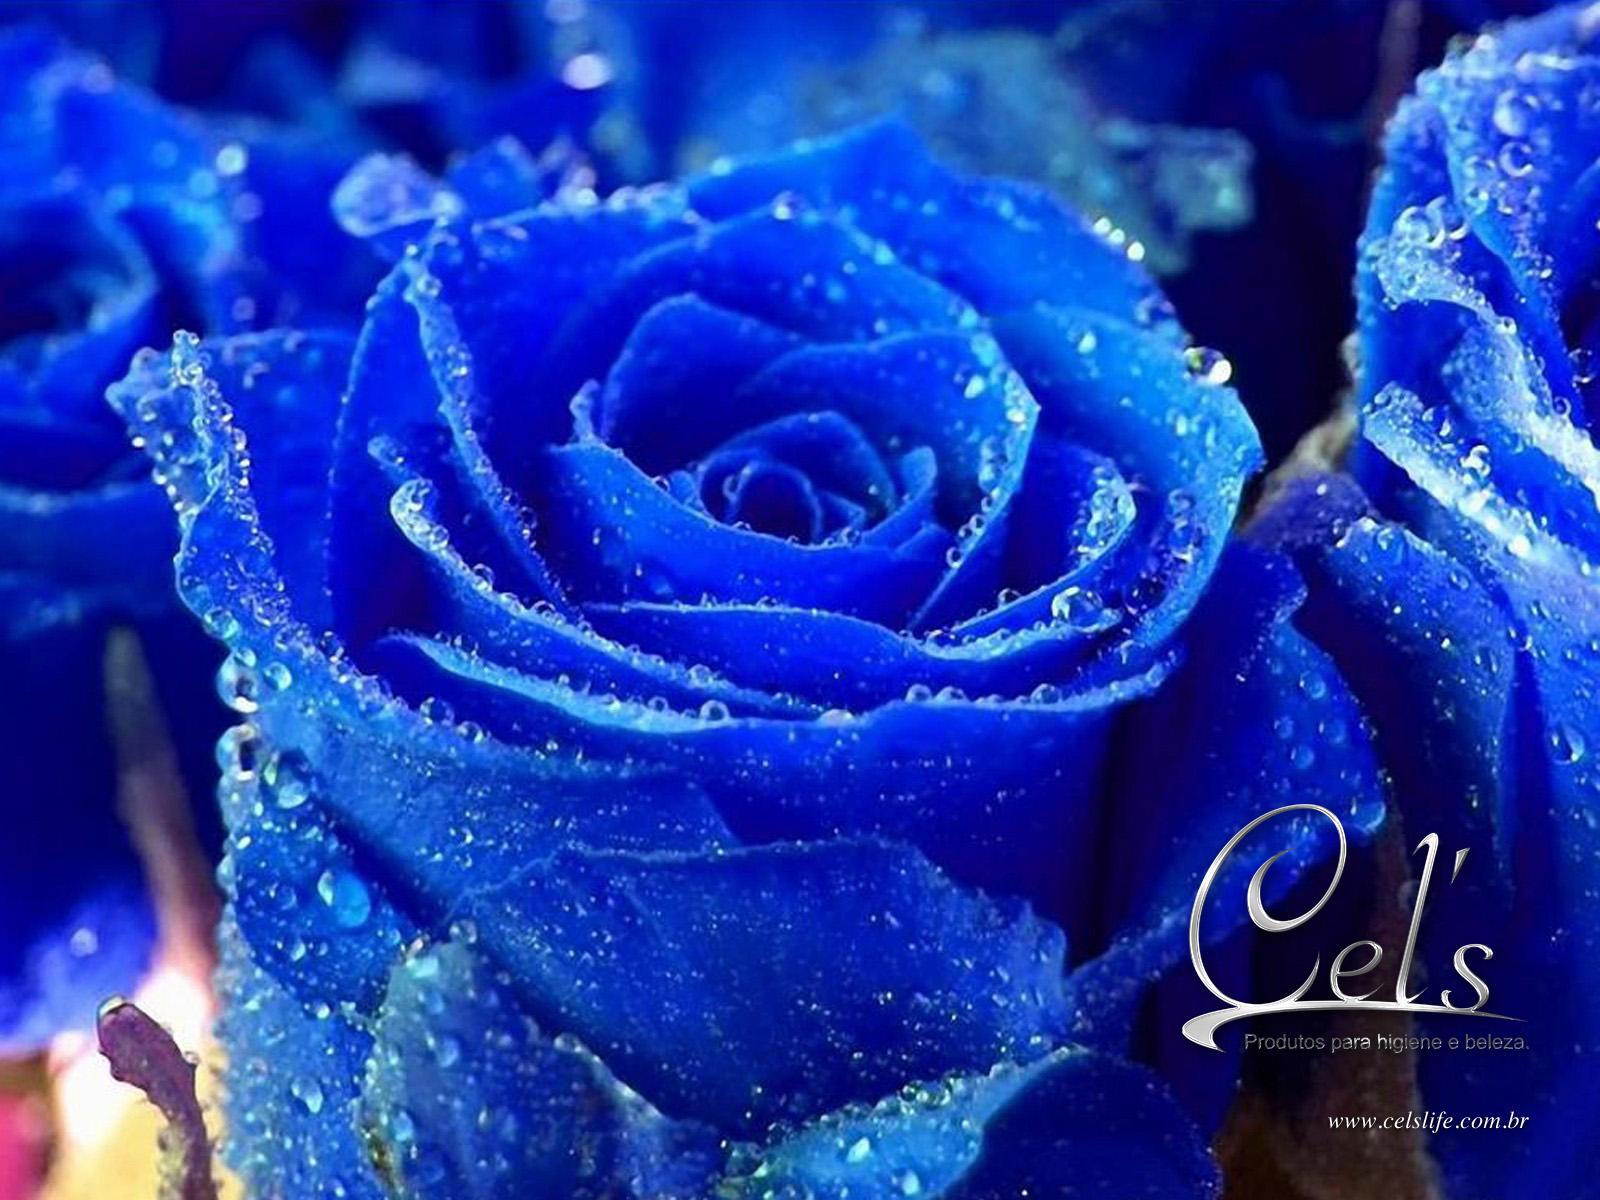 http://1.bp.blogspot.com/-YYvbp6AcNT8/Tt0lya-p8JI/AAAAAAAAC_8/vEUJxaCDqLA/s1600/wall_cels_06.jpg